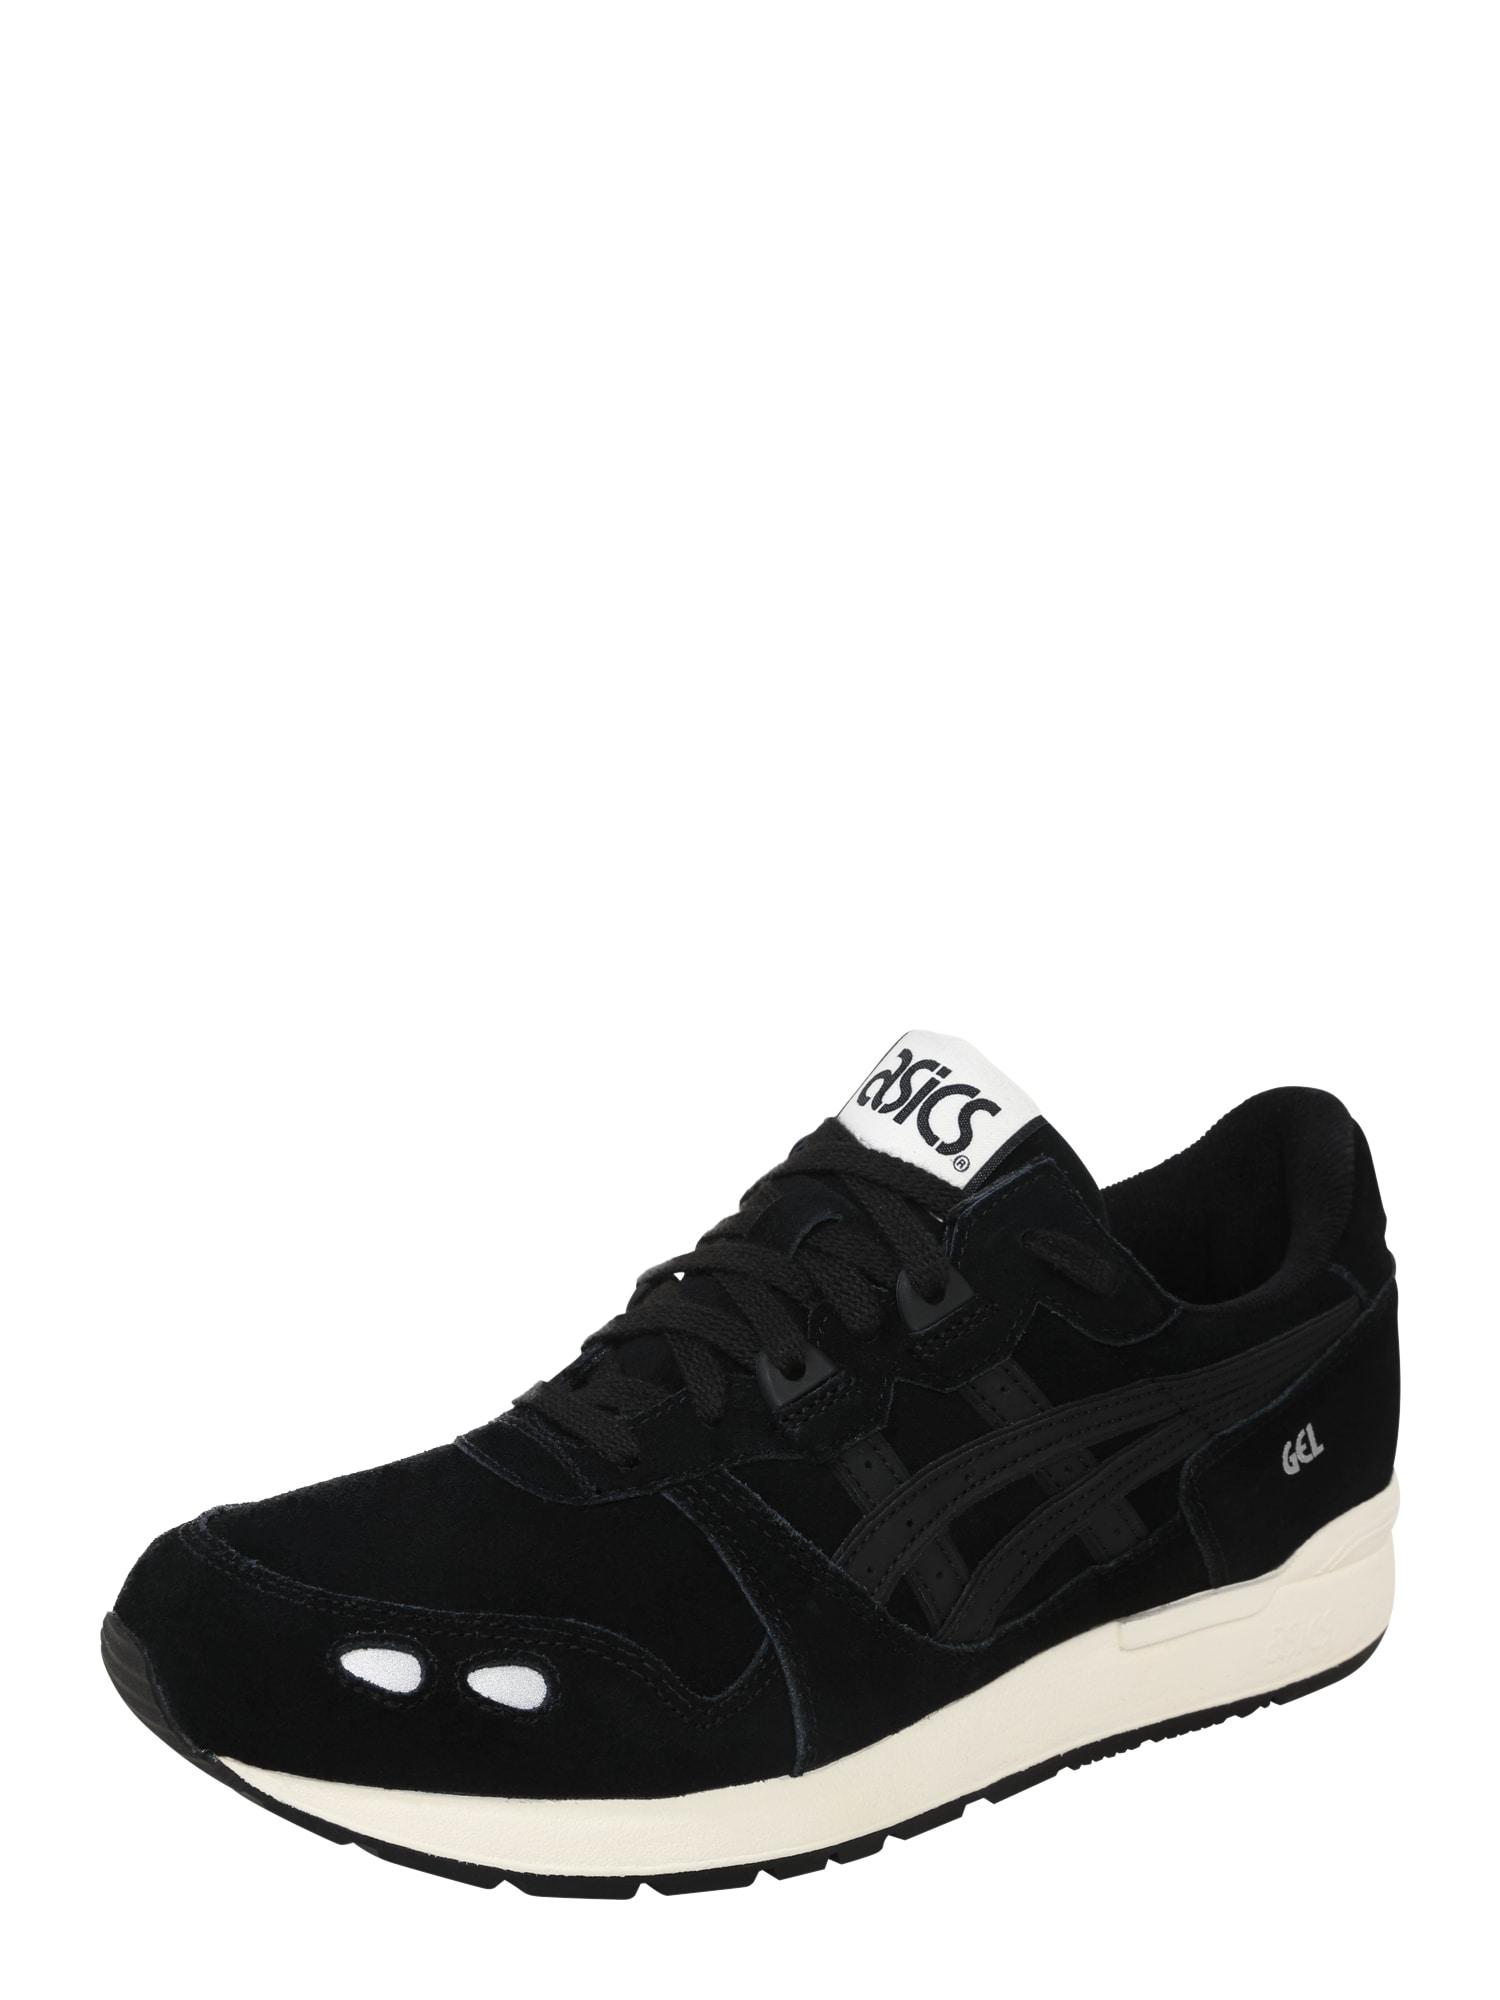 Asics Tiger, Heren Sneakers laag 'GEL-LYTE', zwart / wit